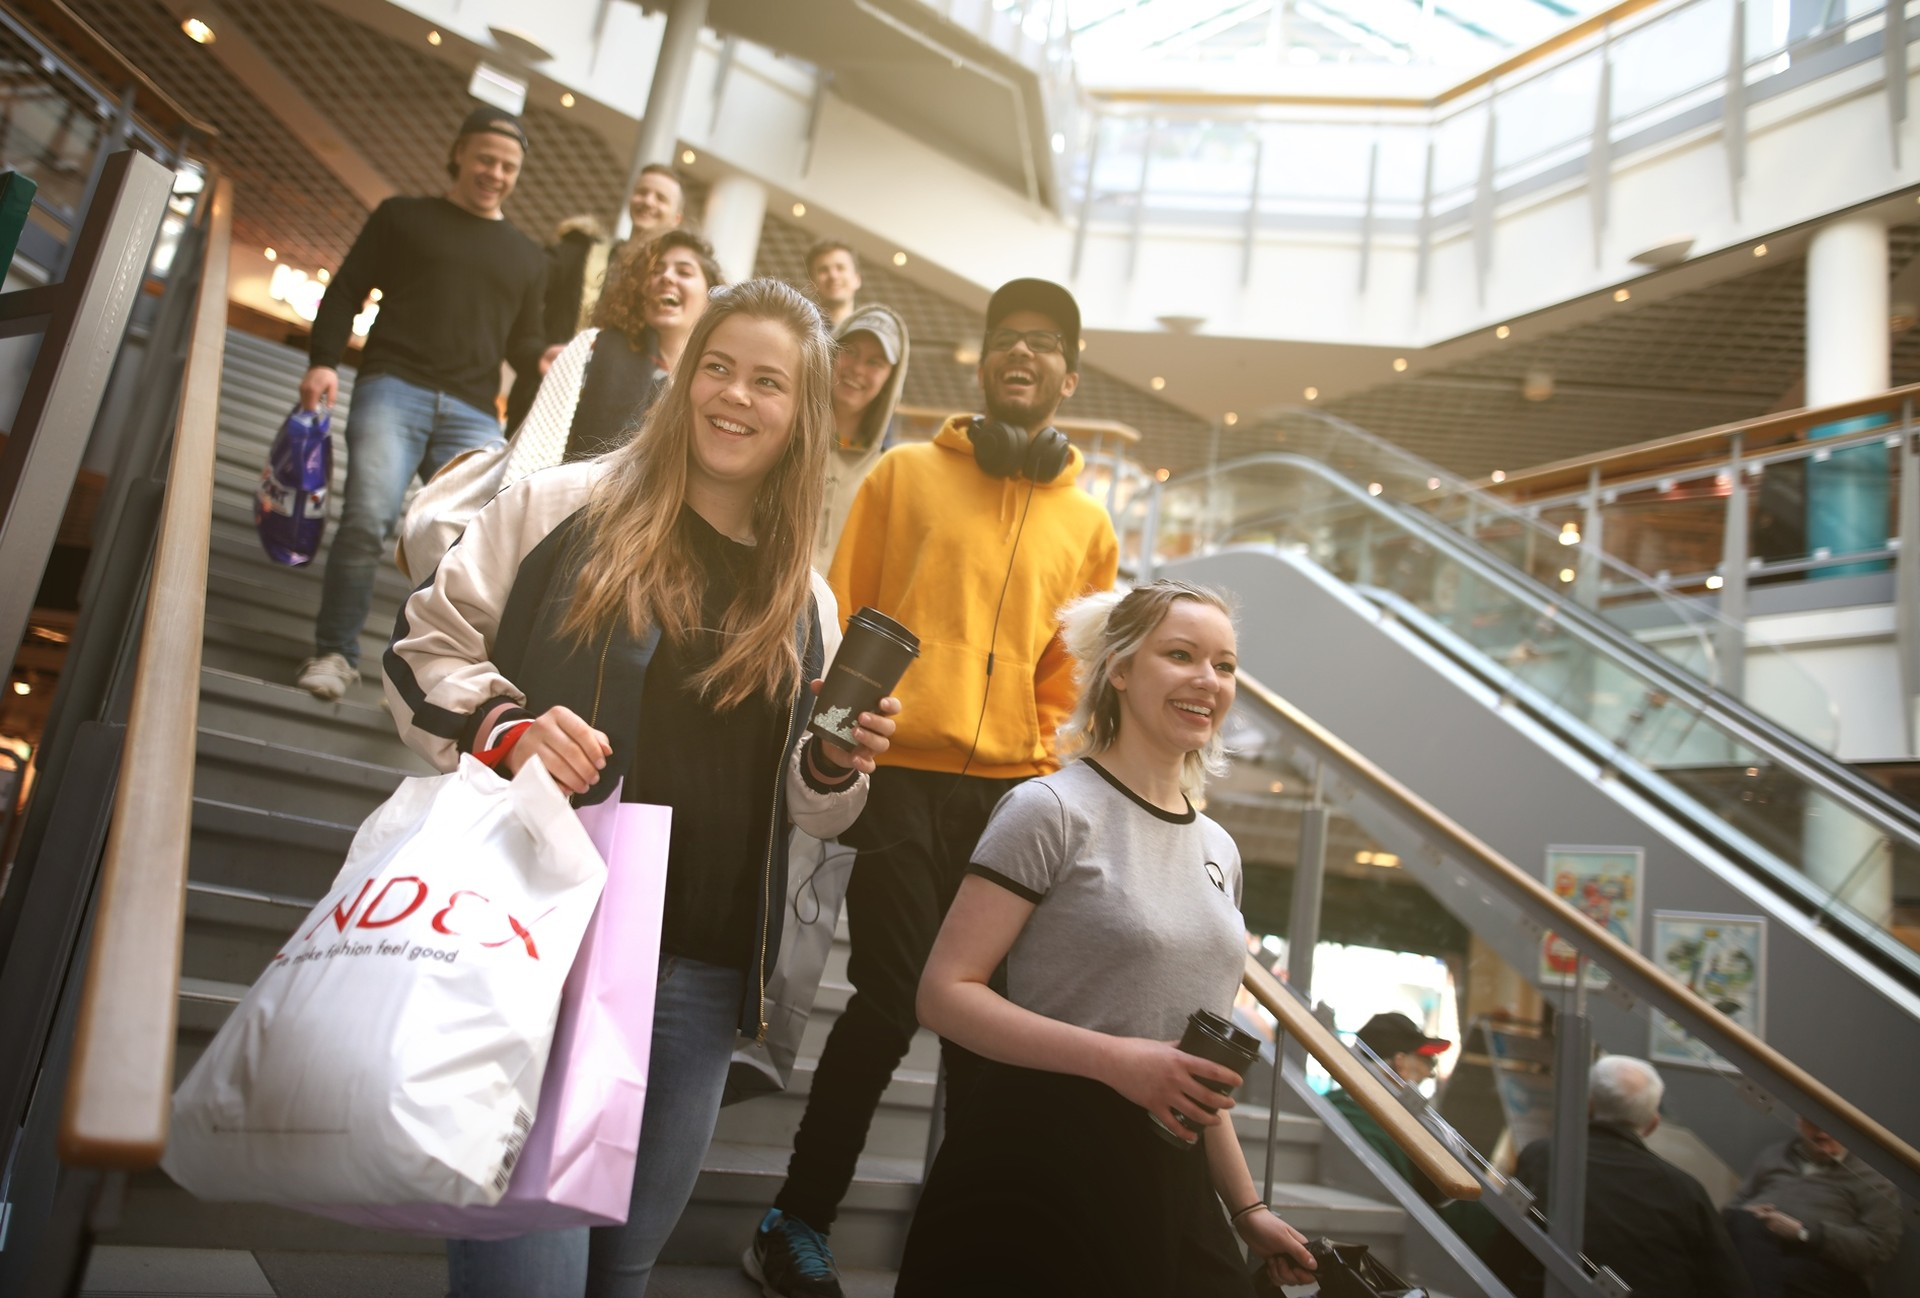 Elever fra Vefsn Folkehøgskole i Mosjøen – byen midt i Norge, shopping på Sjøsiden Senter i Mosjøen, Helgeland